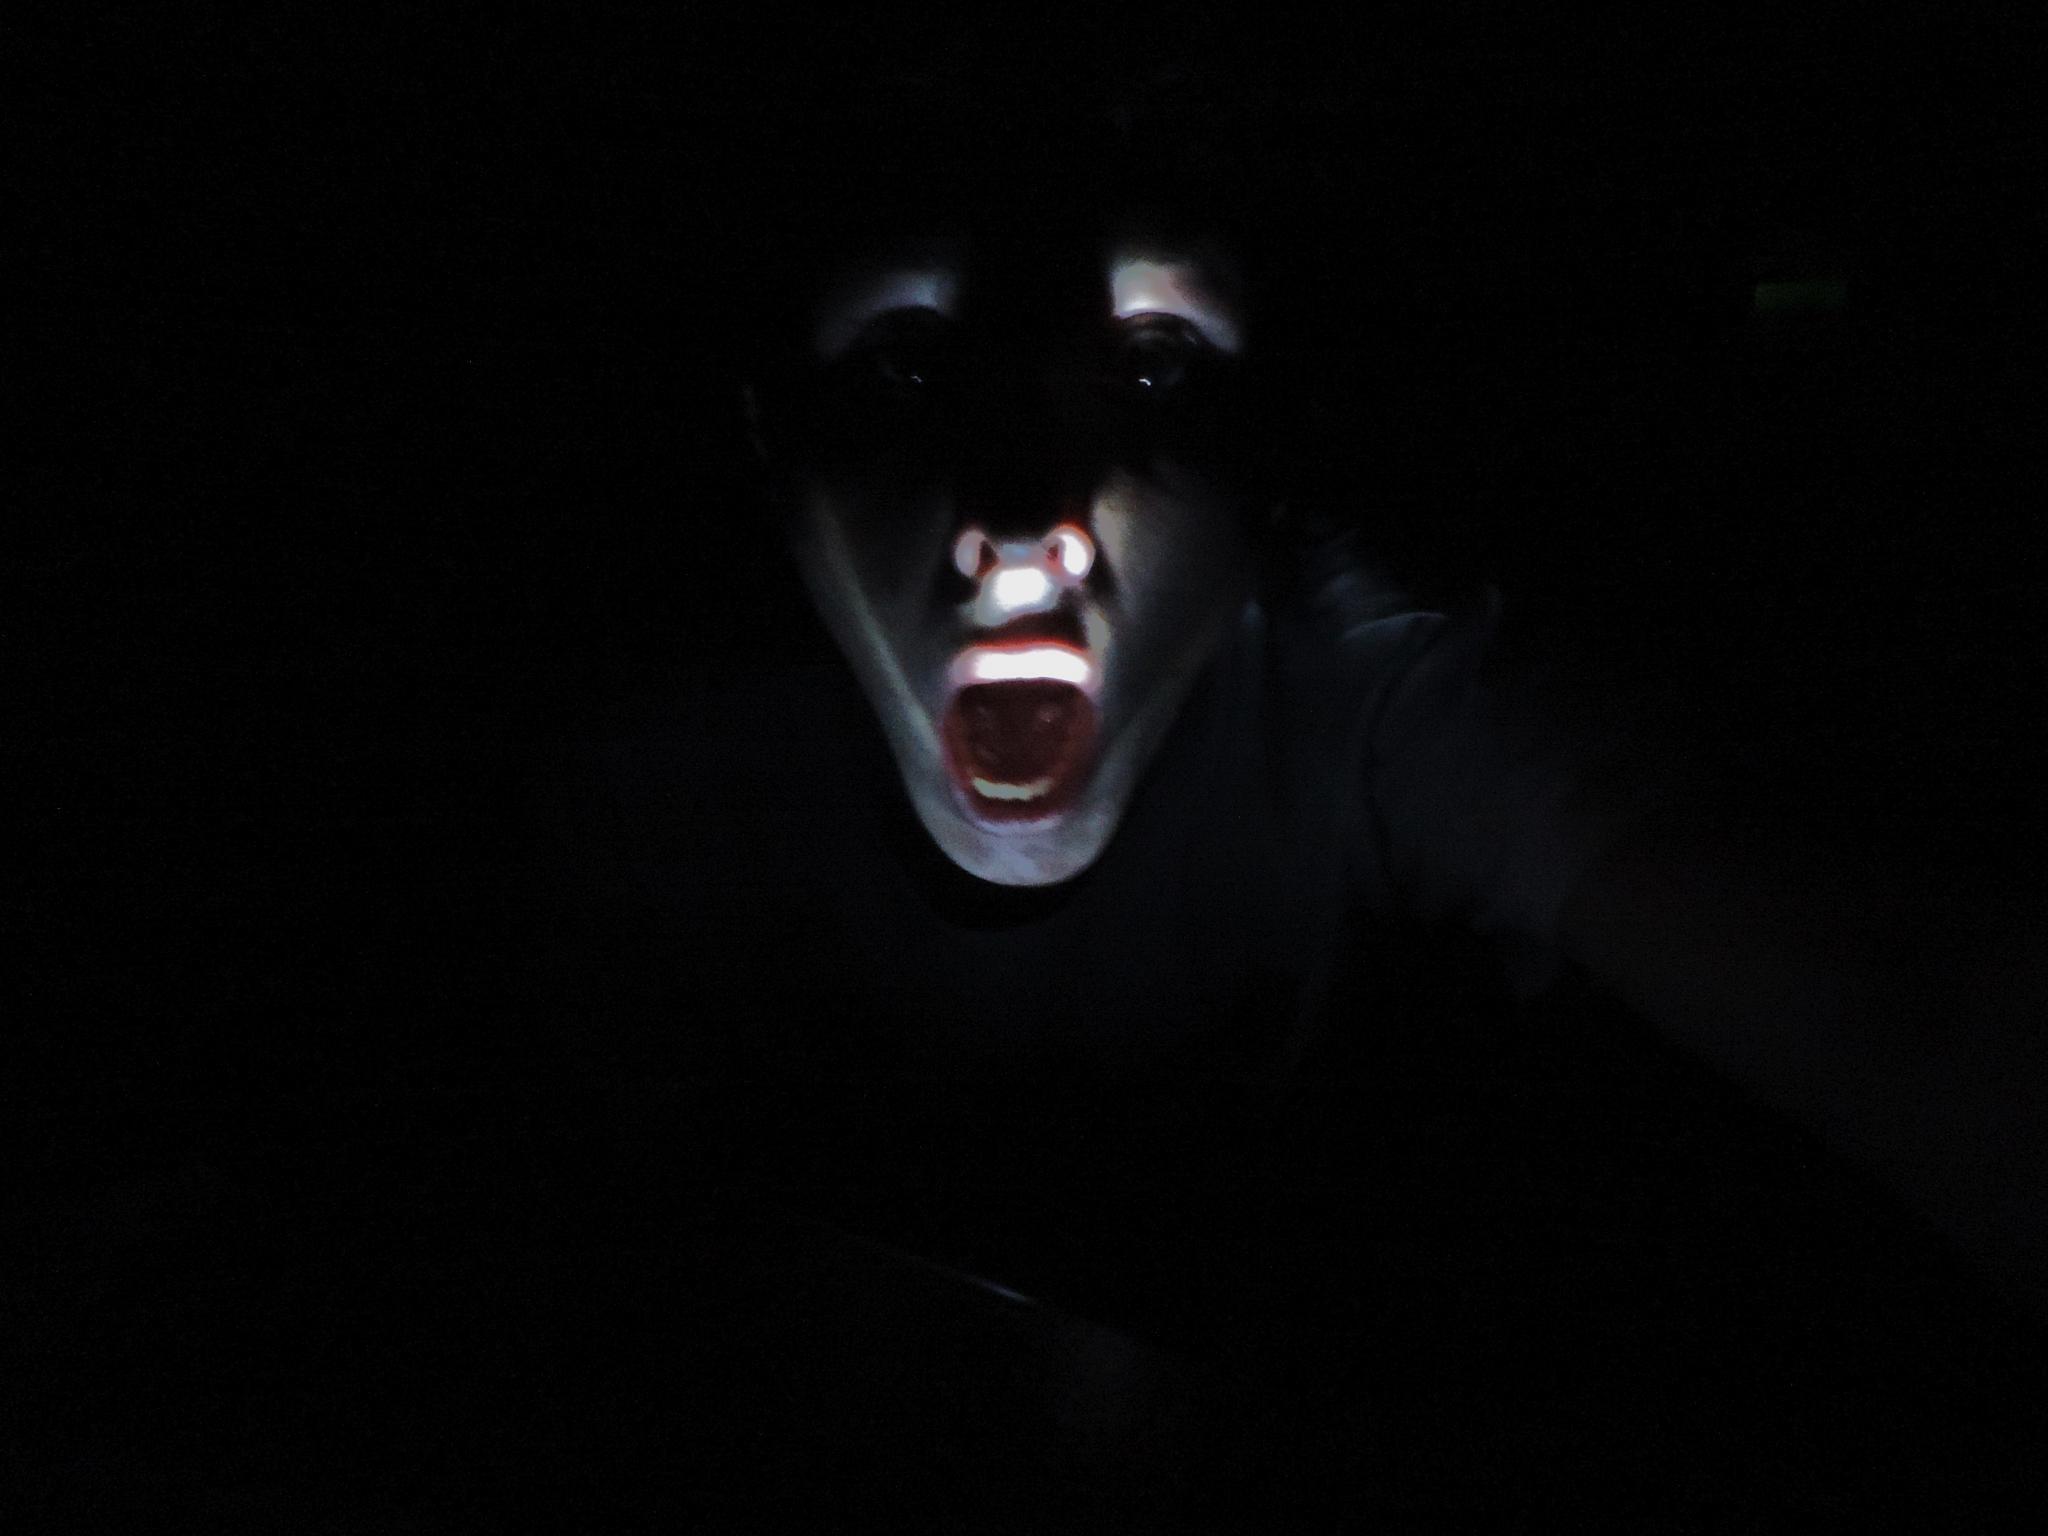 Boo! by Tomas Del Castillo